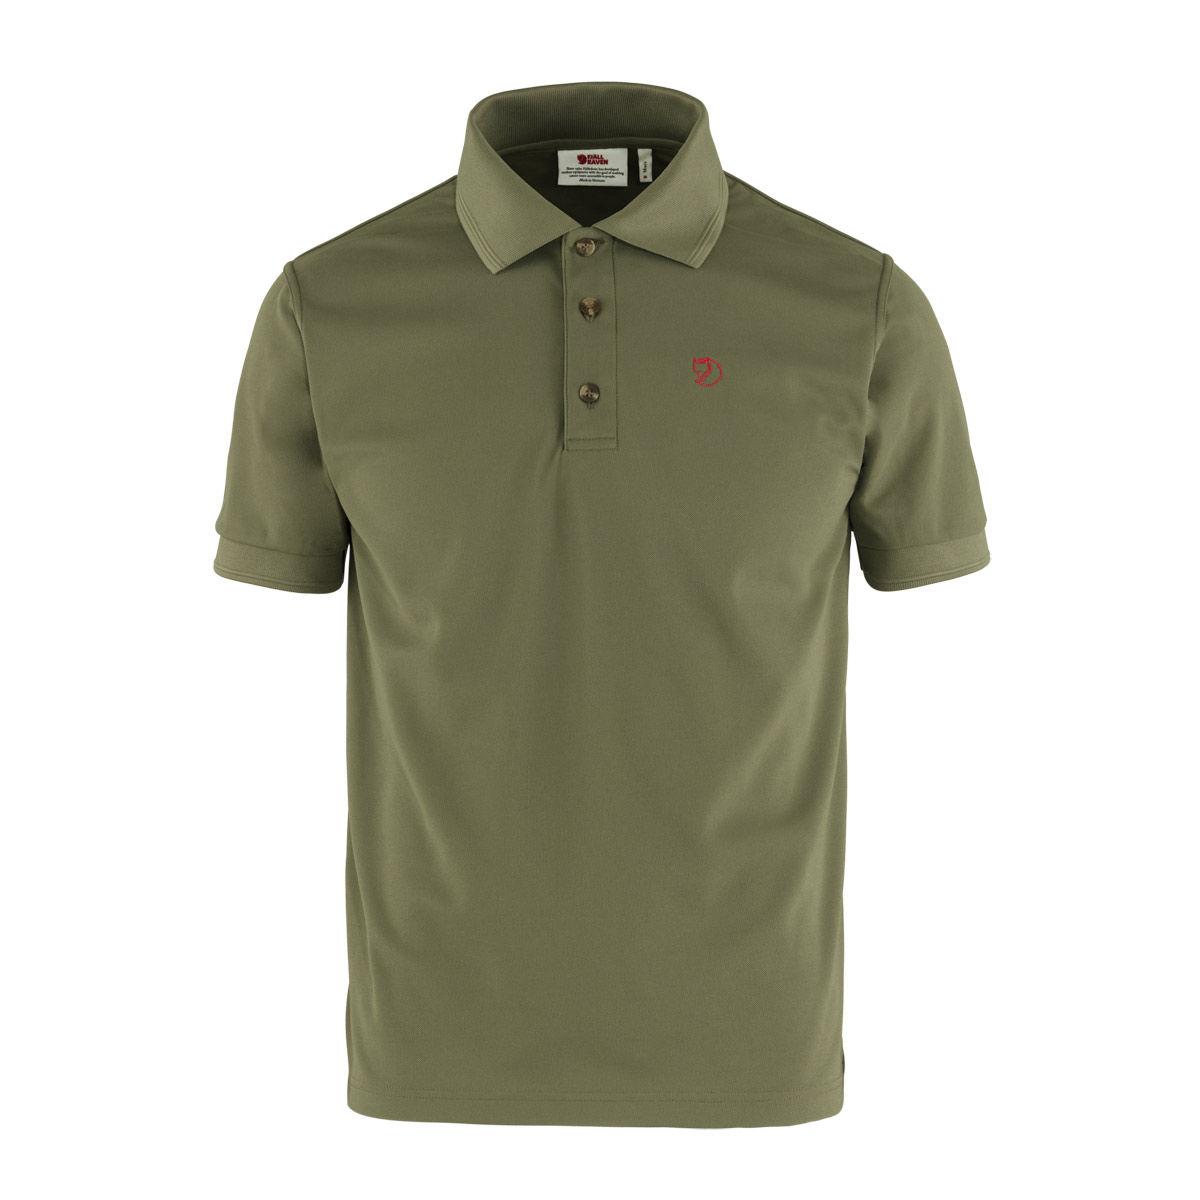 Fjallraven Crowley Pique Shirt - Light Olive